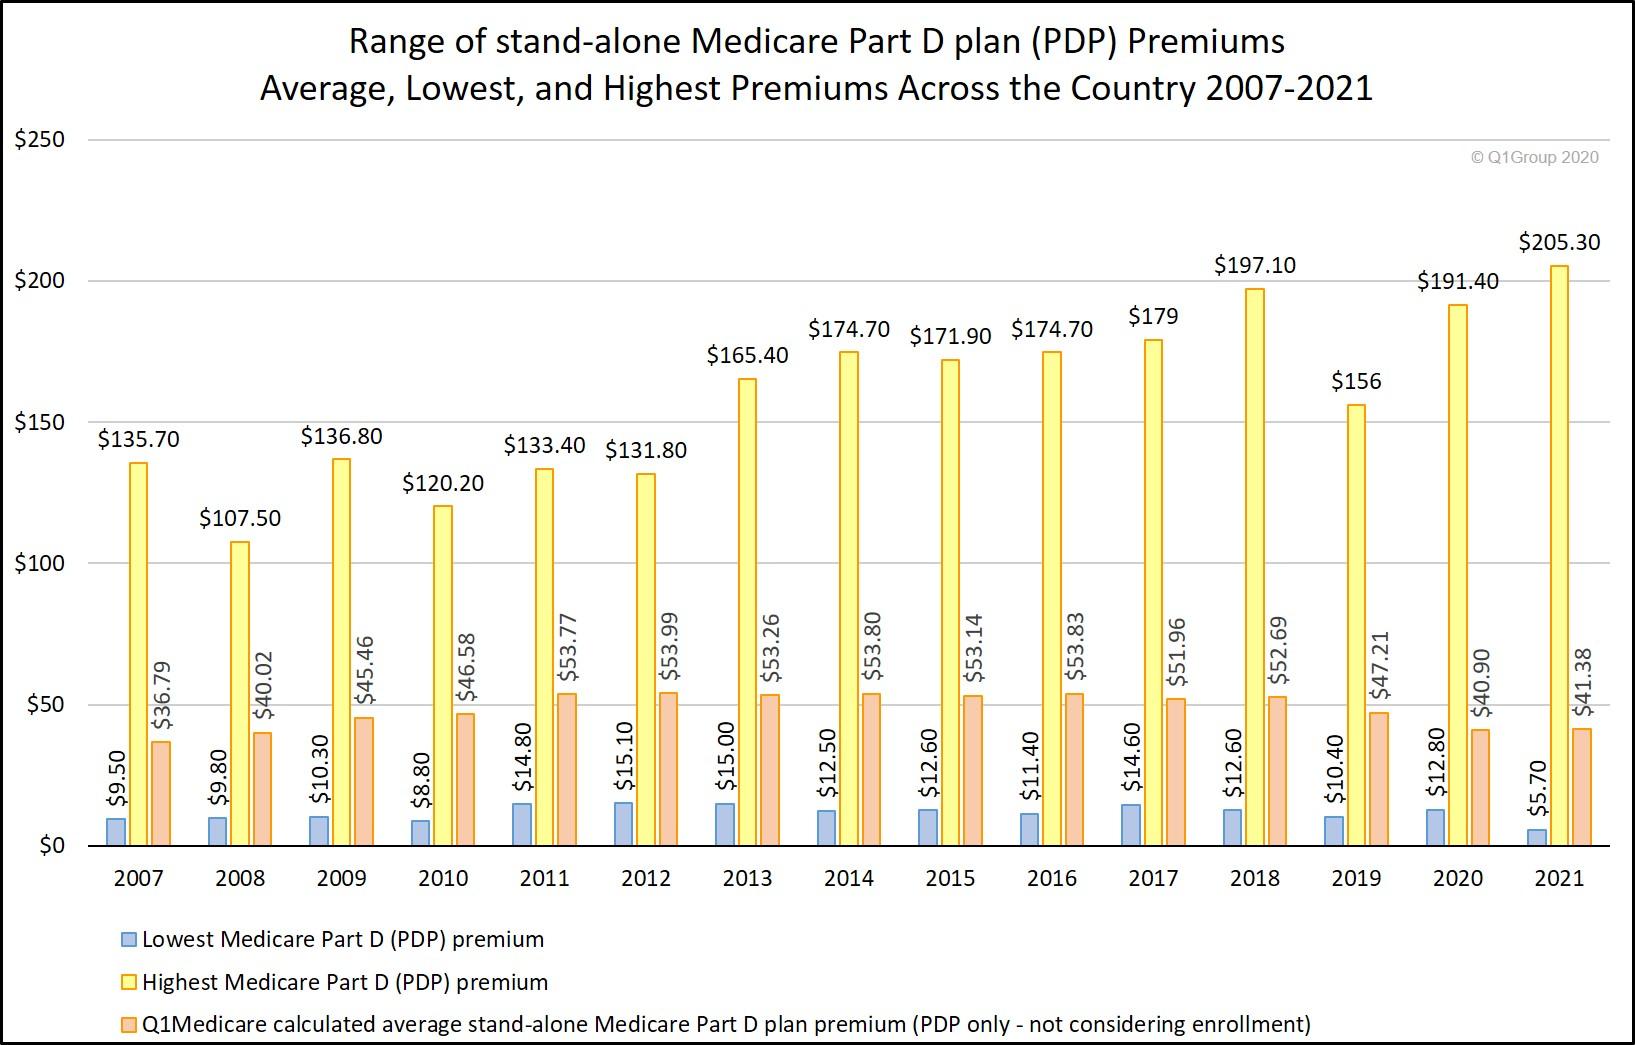 Medicare Part D premium range - highs and lows